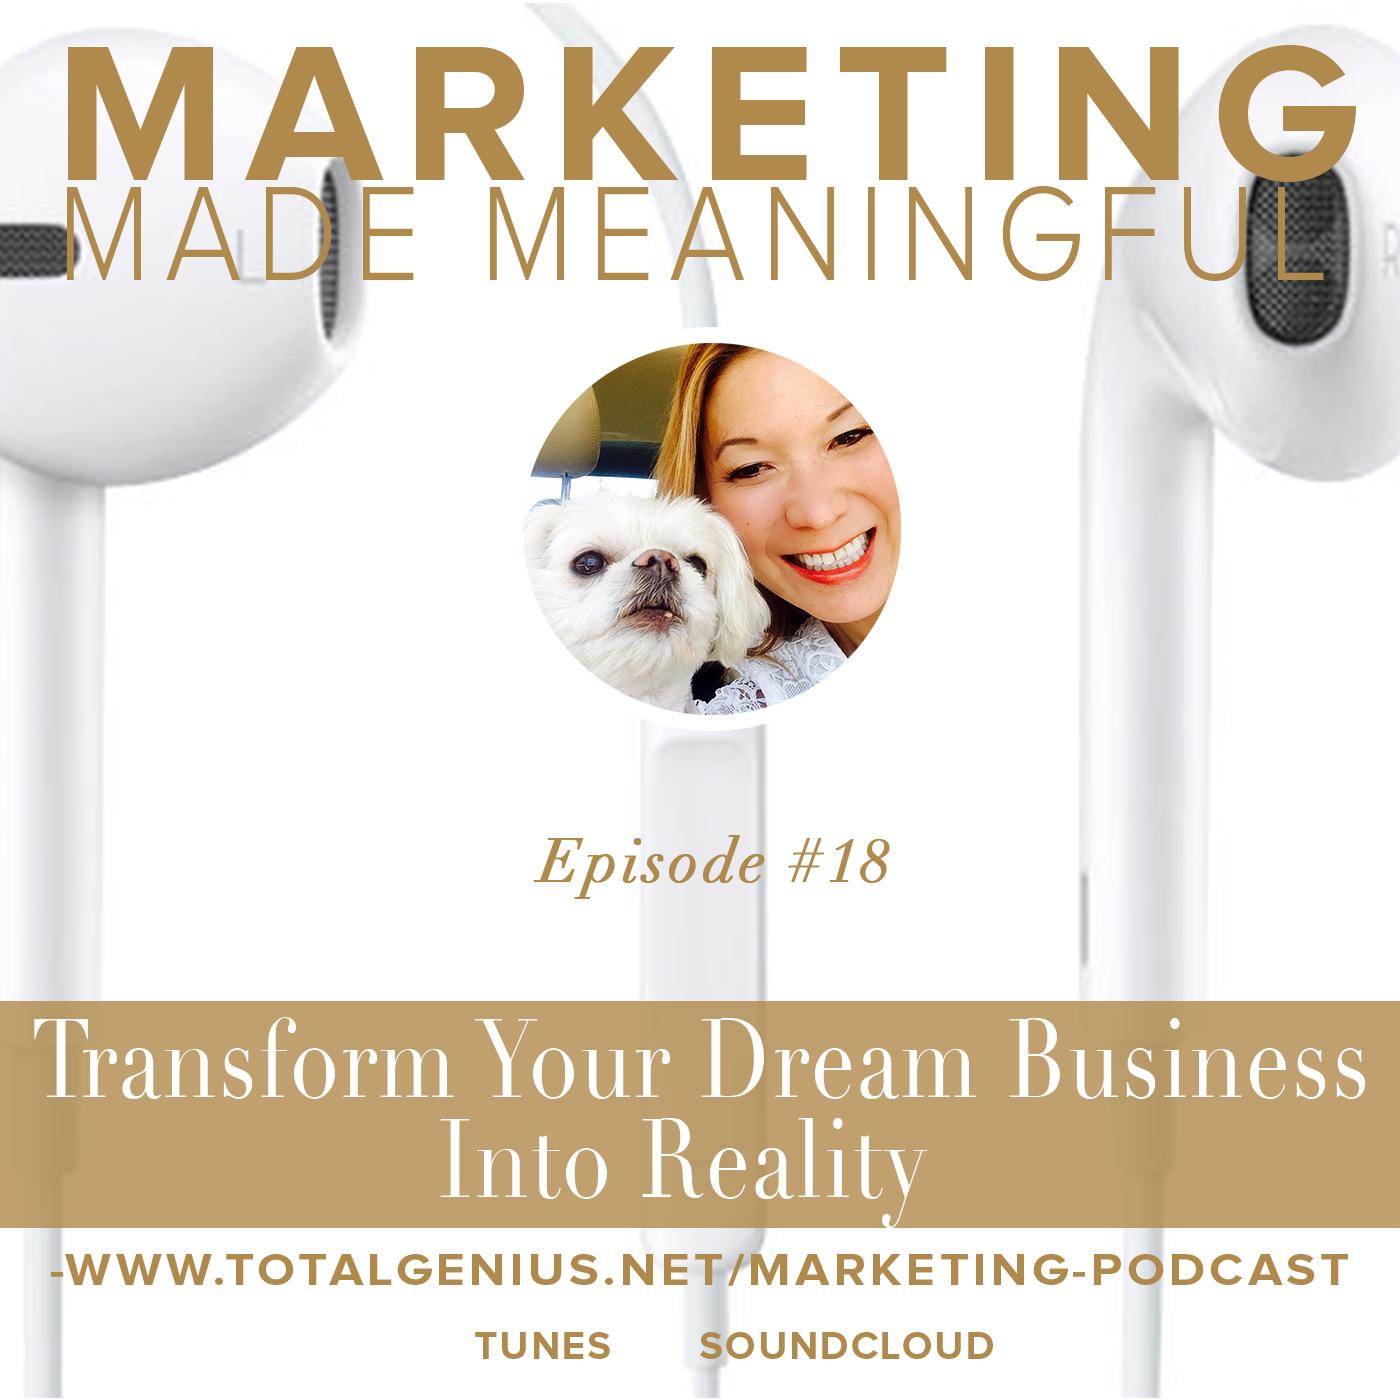 episode #18: Transform your business dream into reality #marketing #podcast #entrepreneur